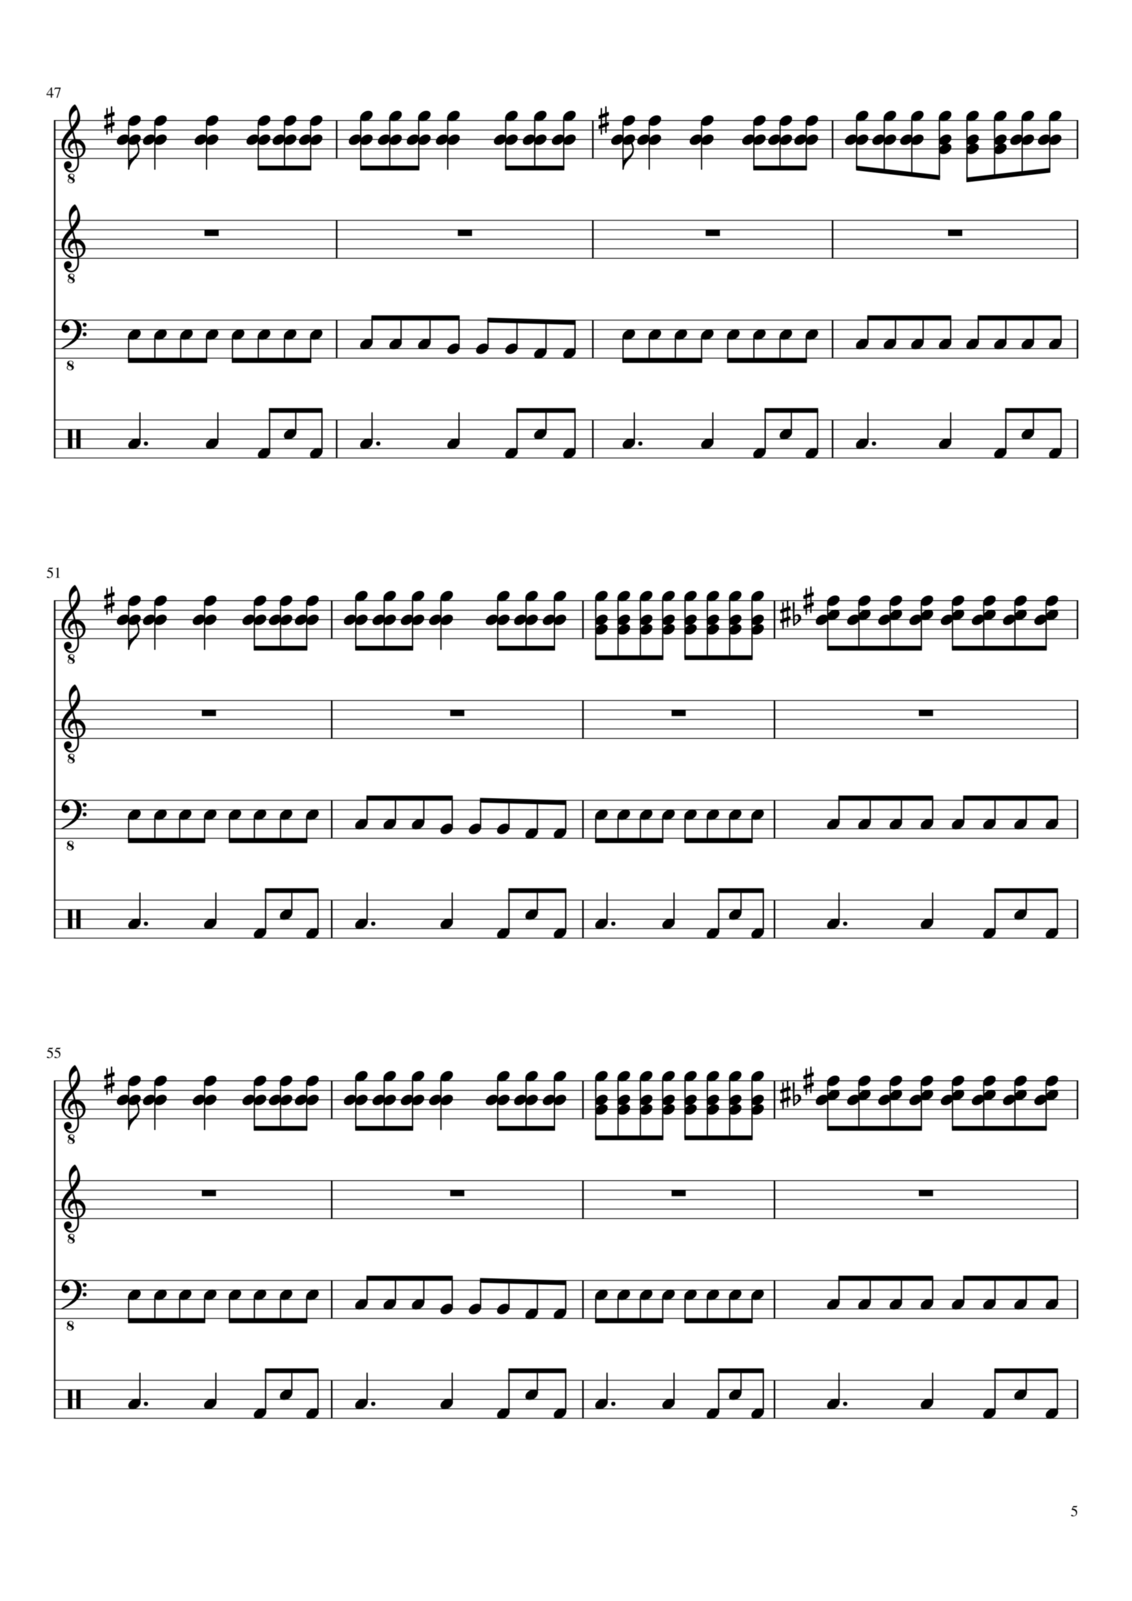 Deklassirovannyim elementam slide, Image 5